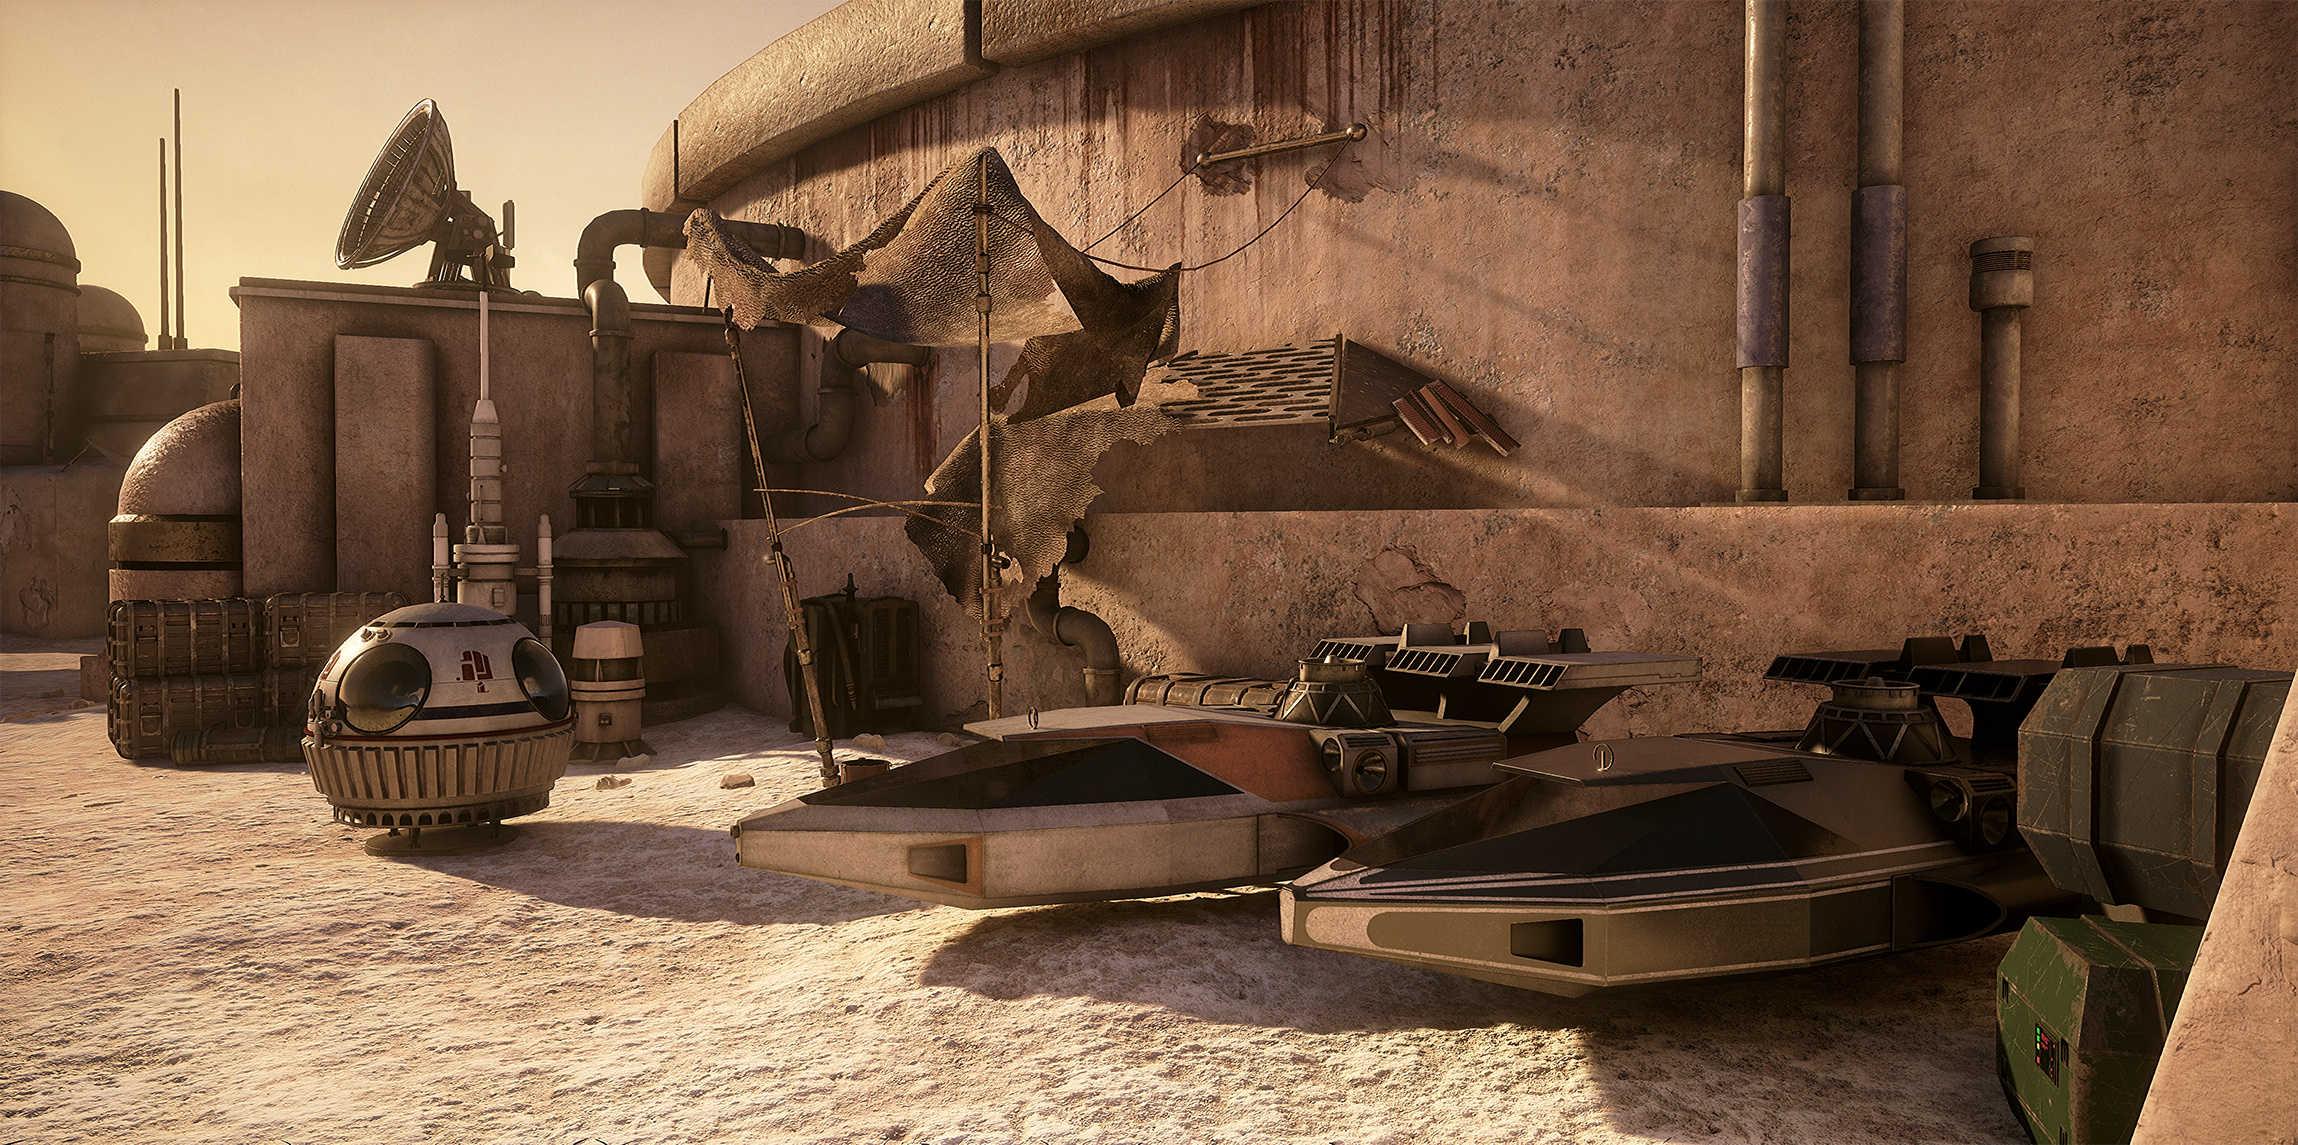 Obsidian devs recreate Star Wars Mos Eisley in Unreal Engine 4